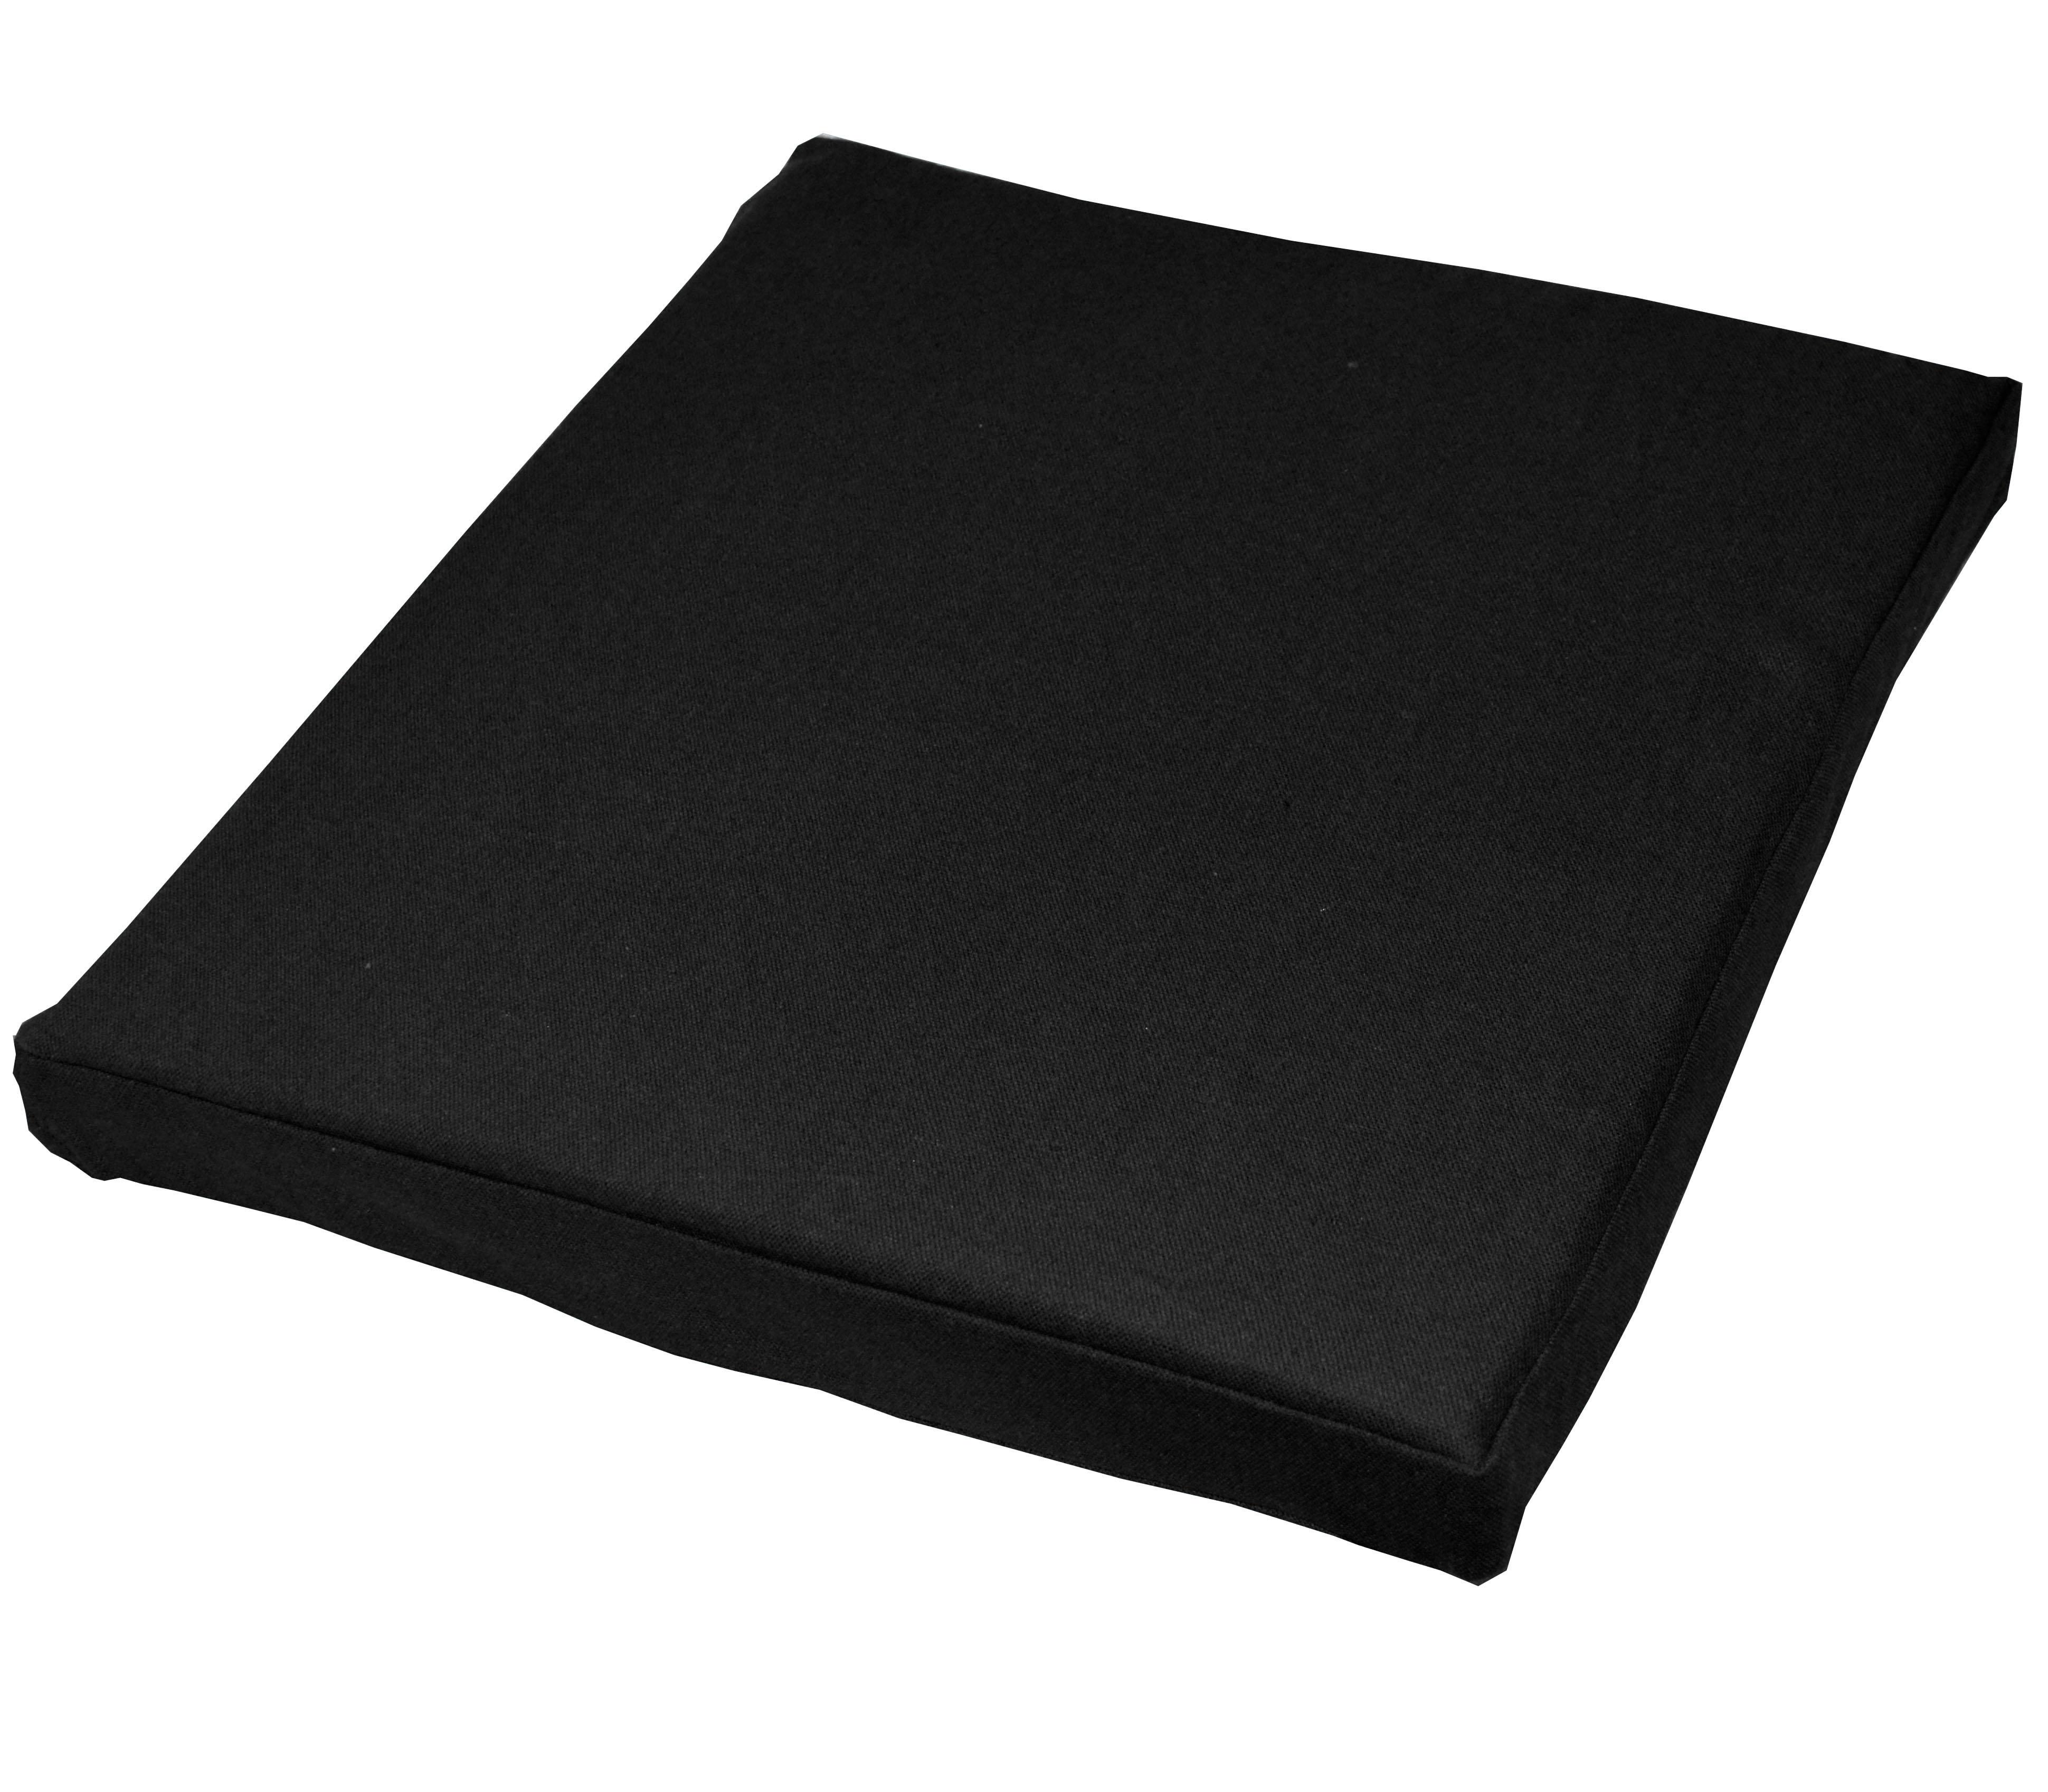 aa152t black plain cotton canvas 3d box sofa seat cushion cover custom size ebay. Black Bedroom Furniture Sets. Home Design Ideas